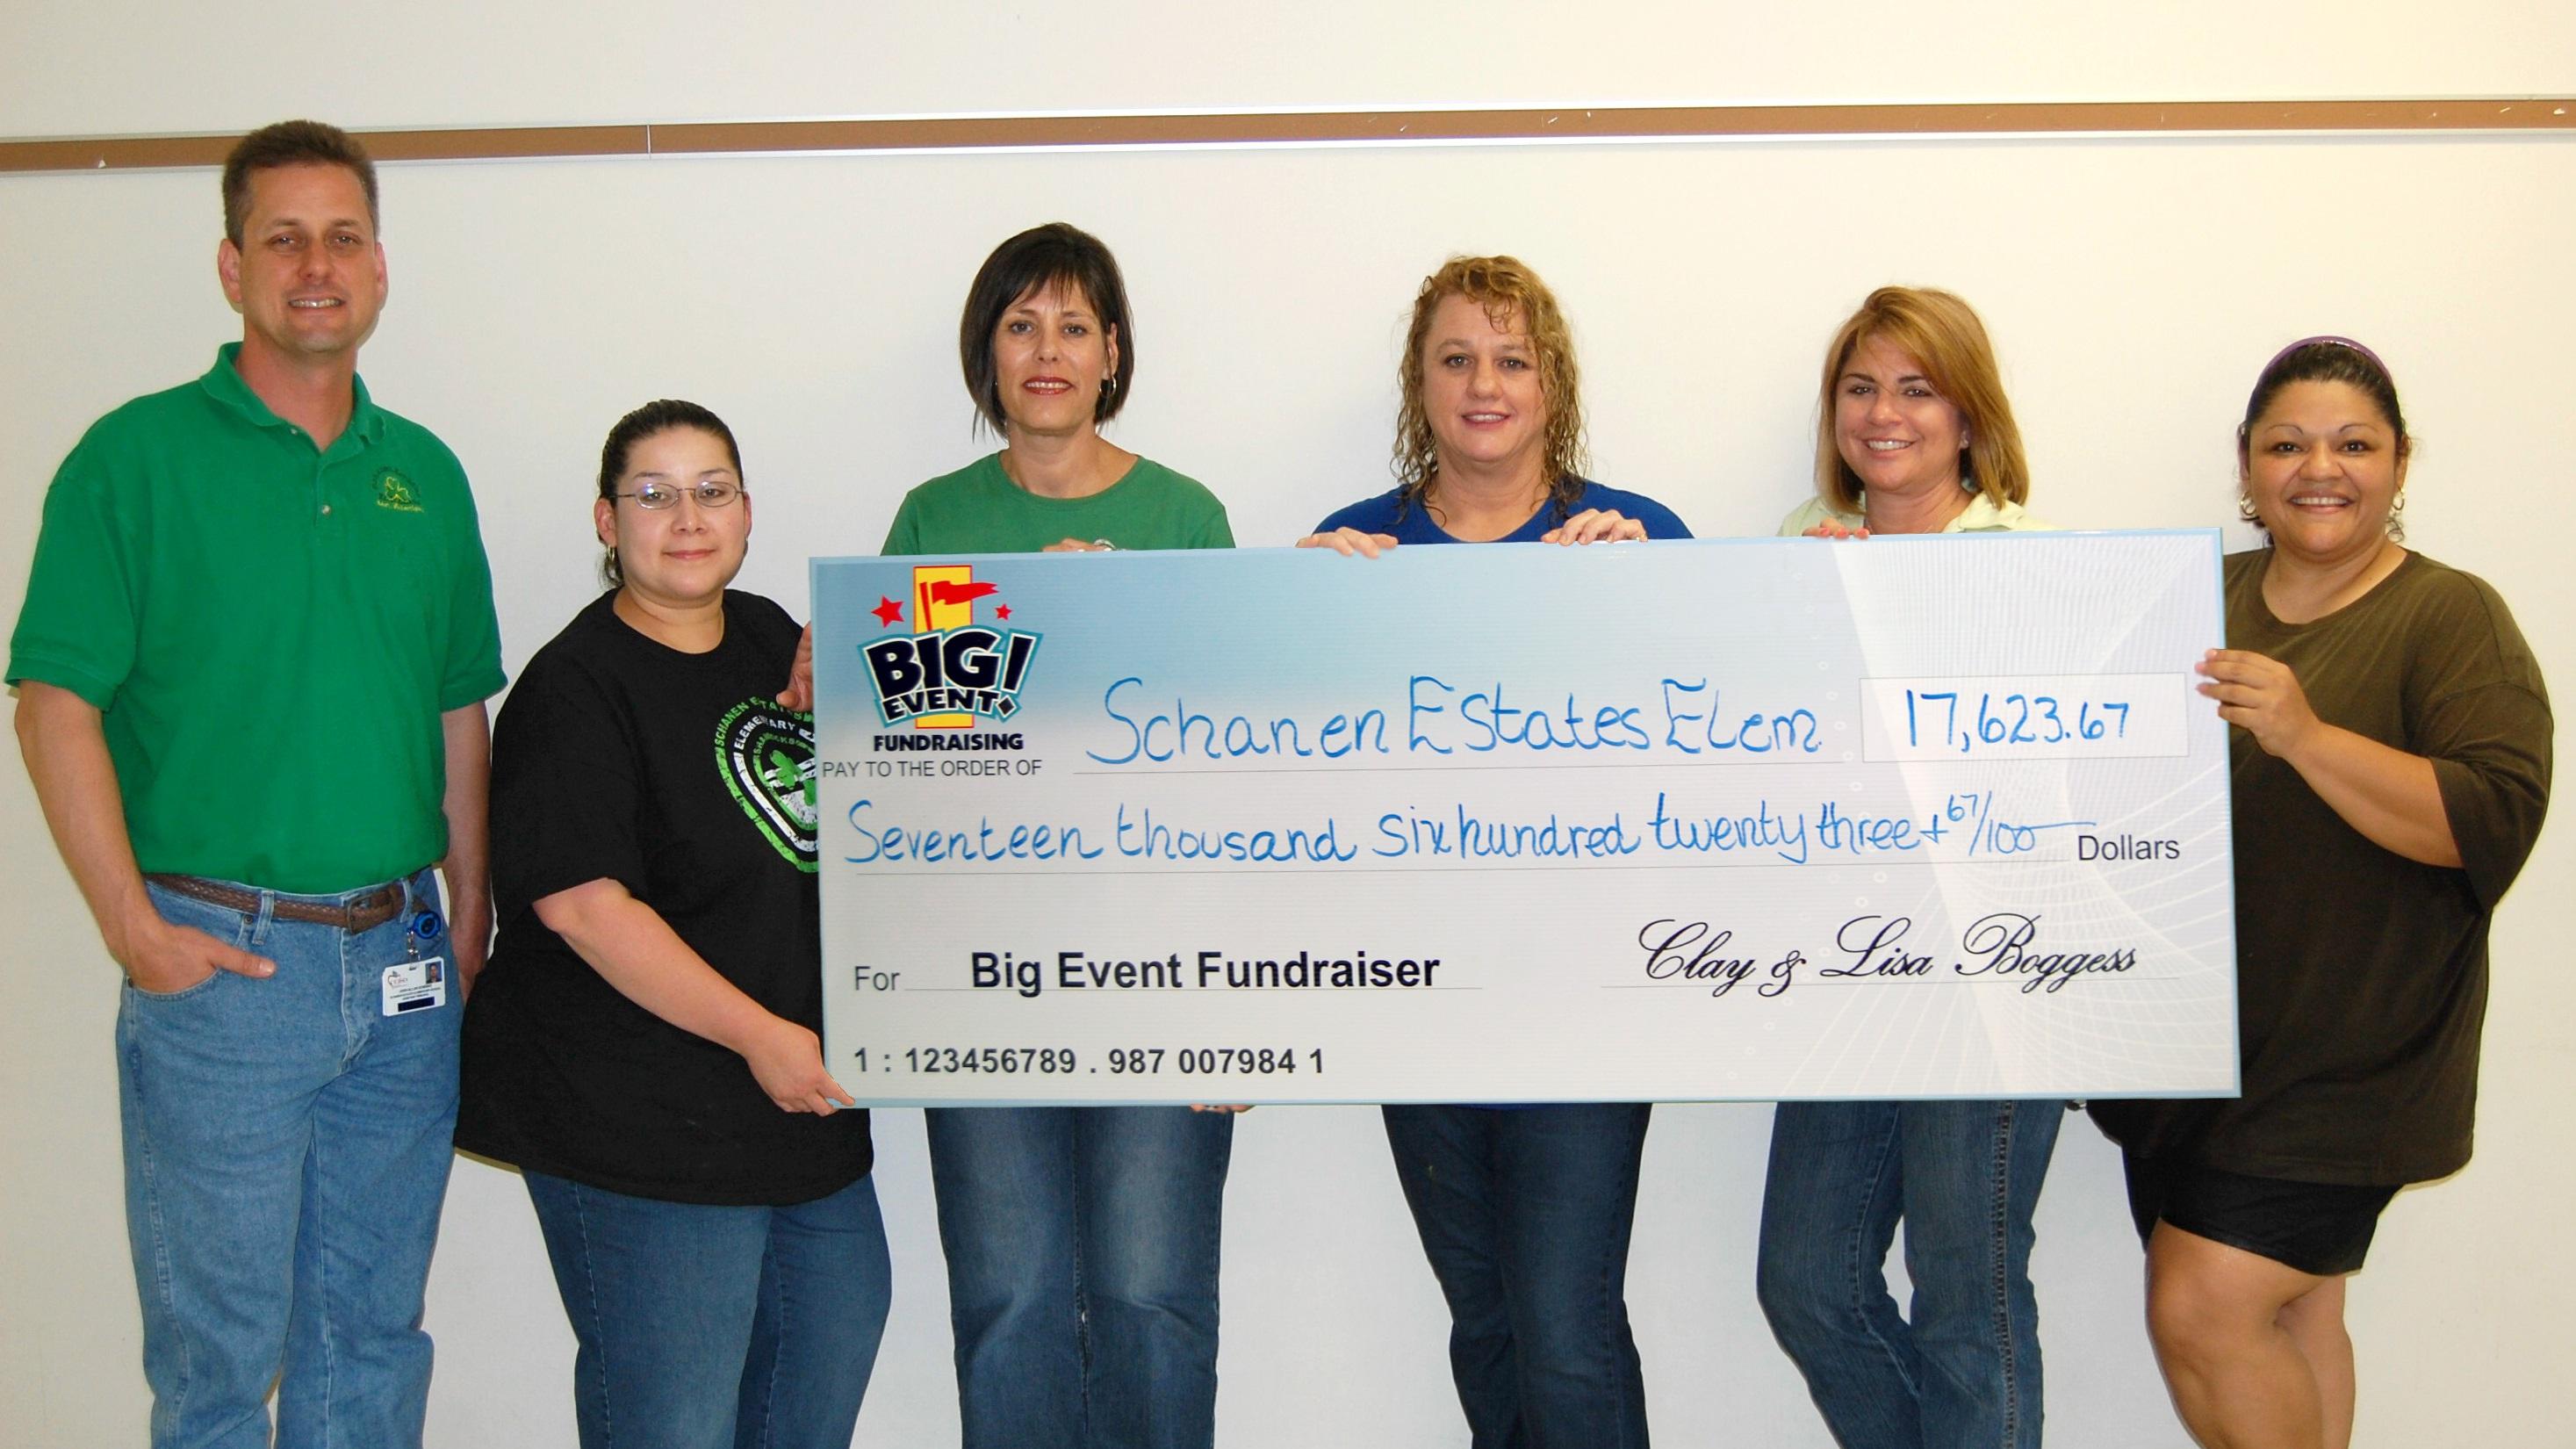 Schanen Estates Elementary School fundraising team holding check